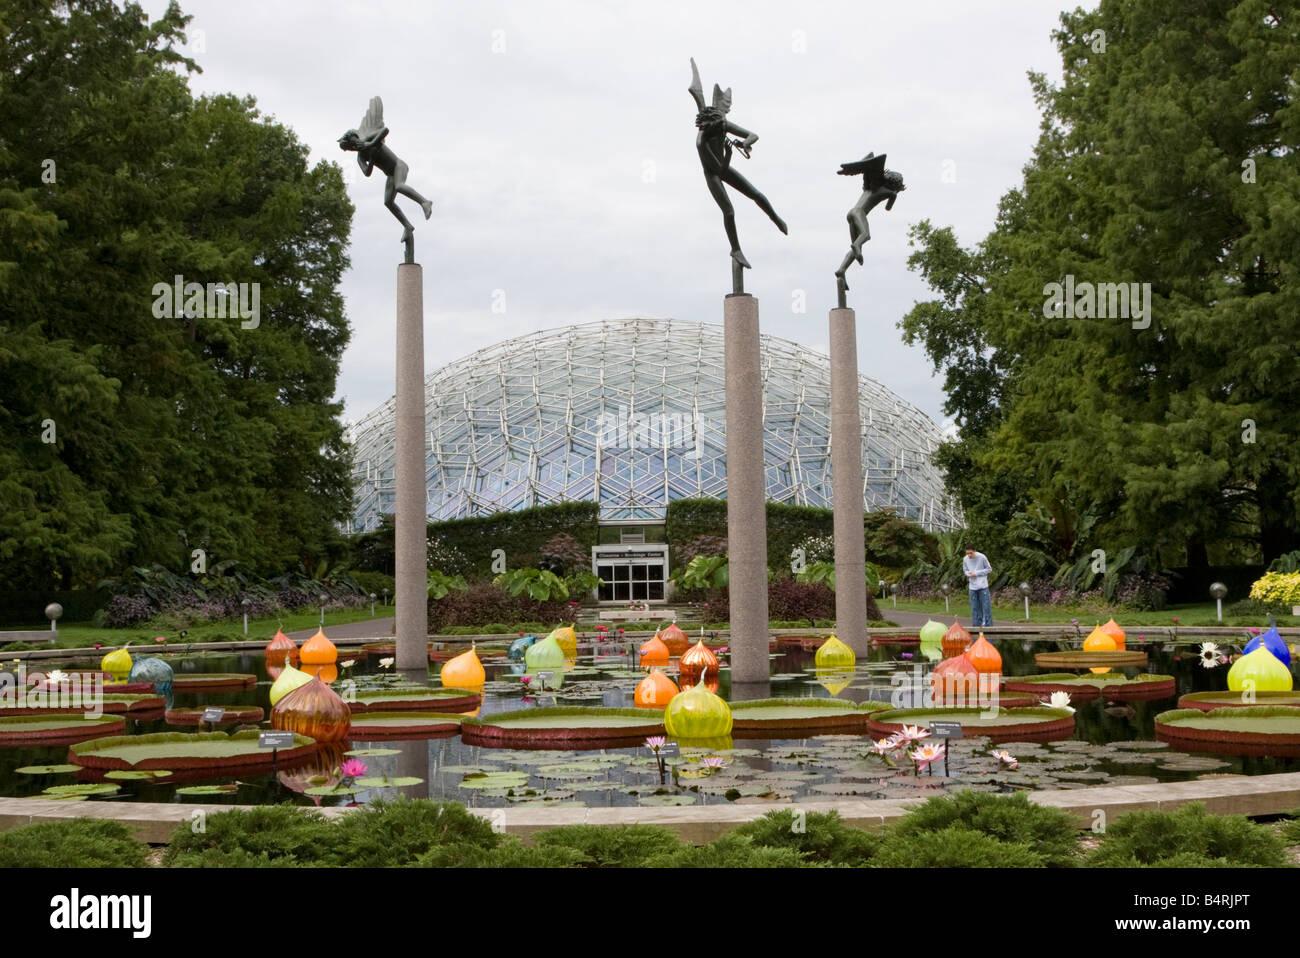 St louis missouri missouri botanical garden sculpture - Missouri botanical garden st louis mo ...